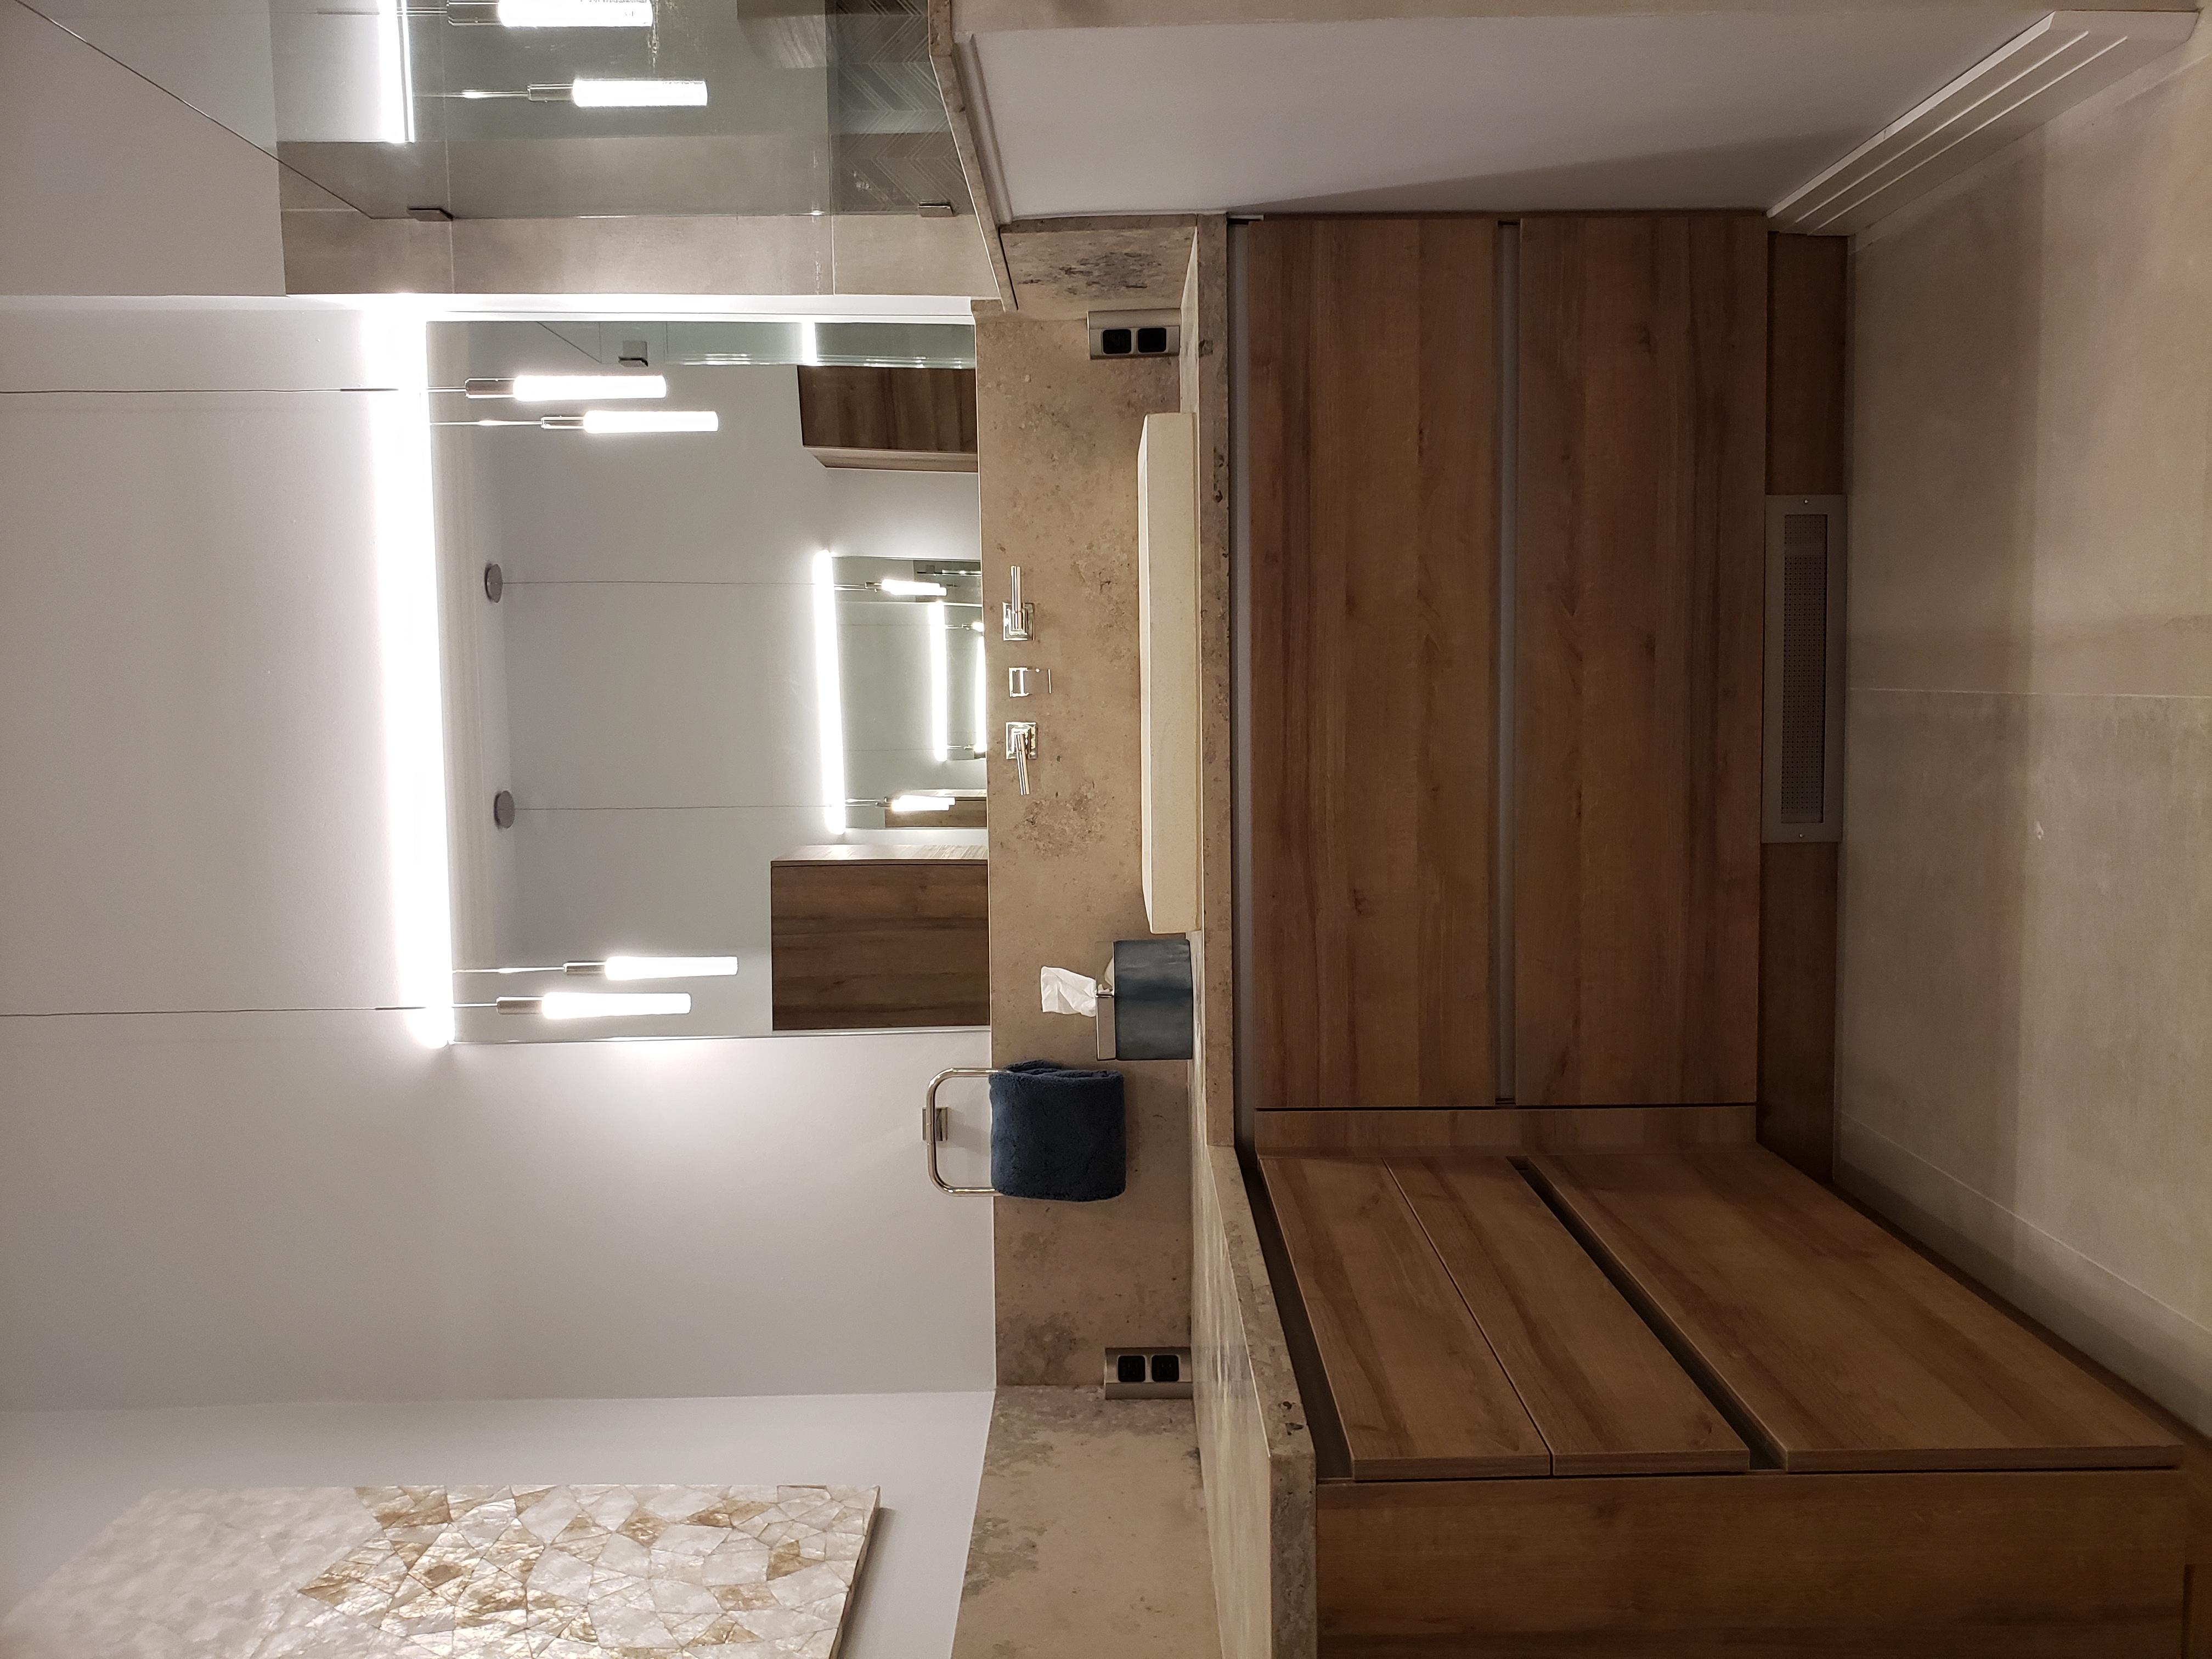 Handleless Bathroom Cabinets